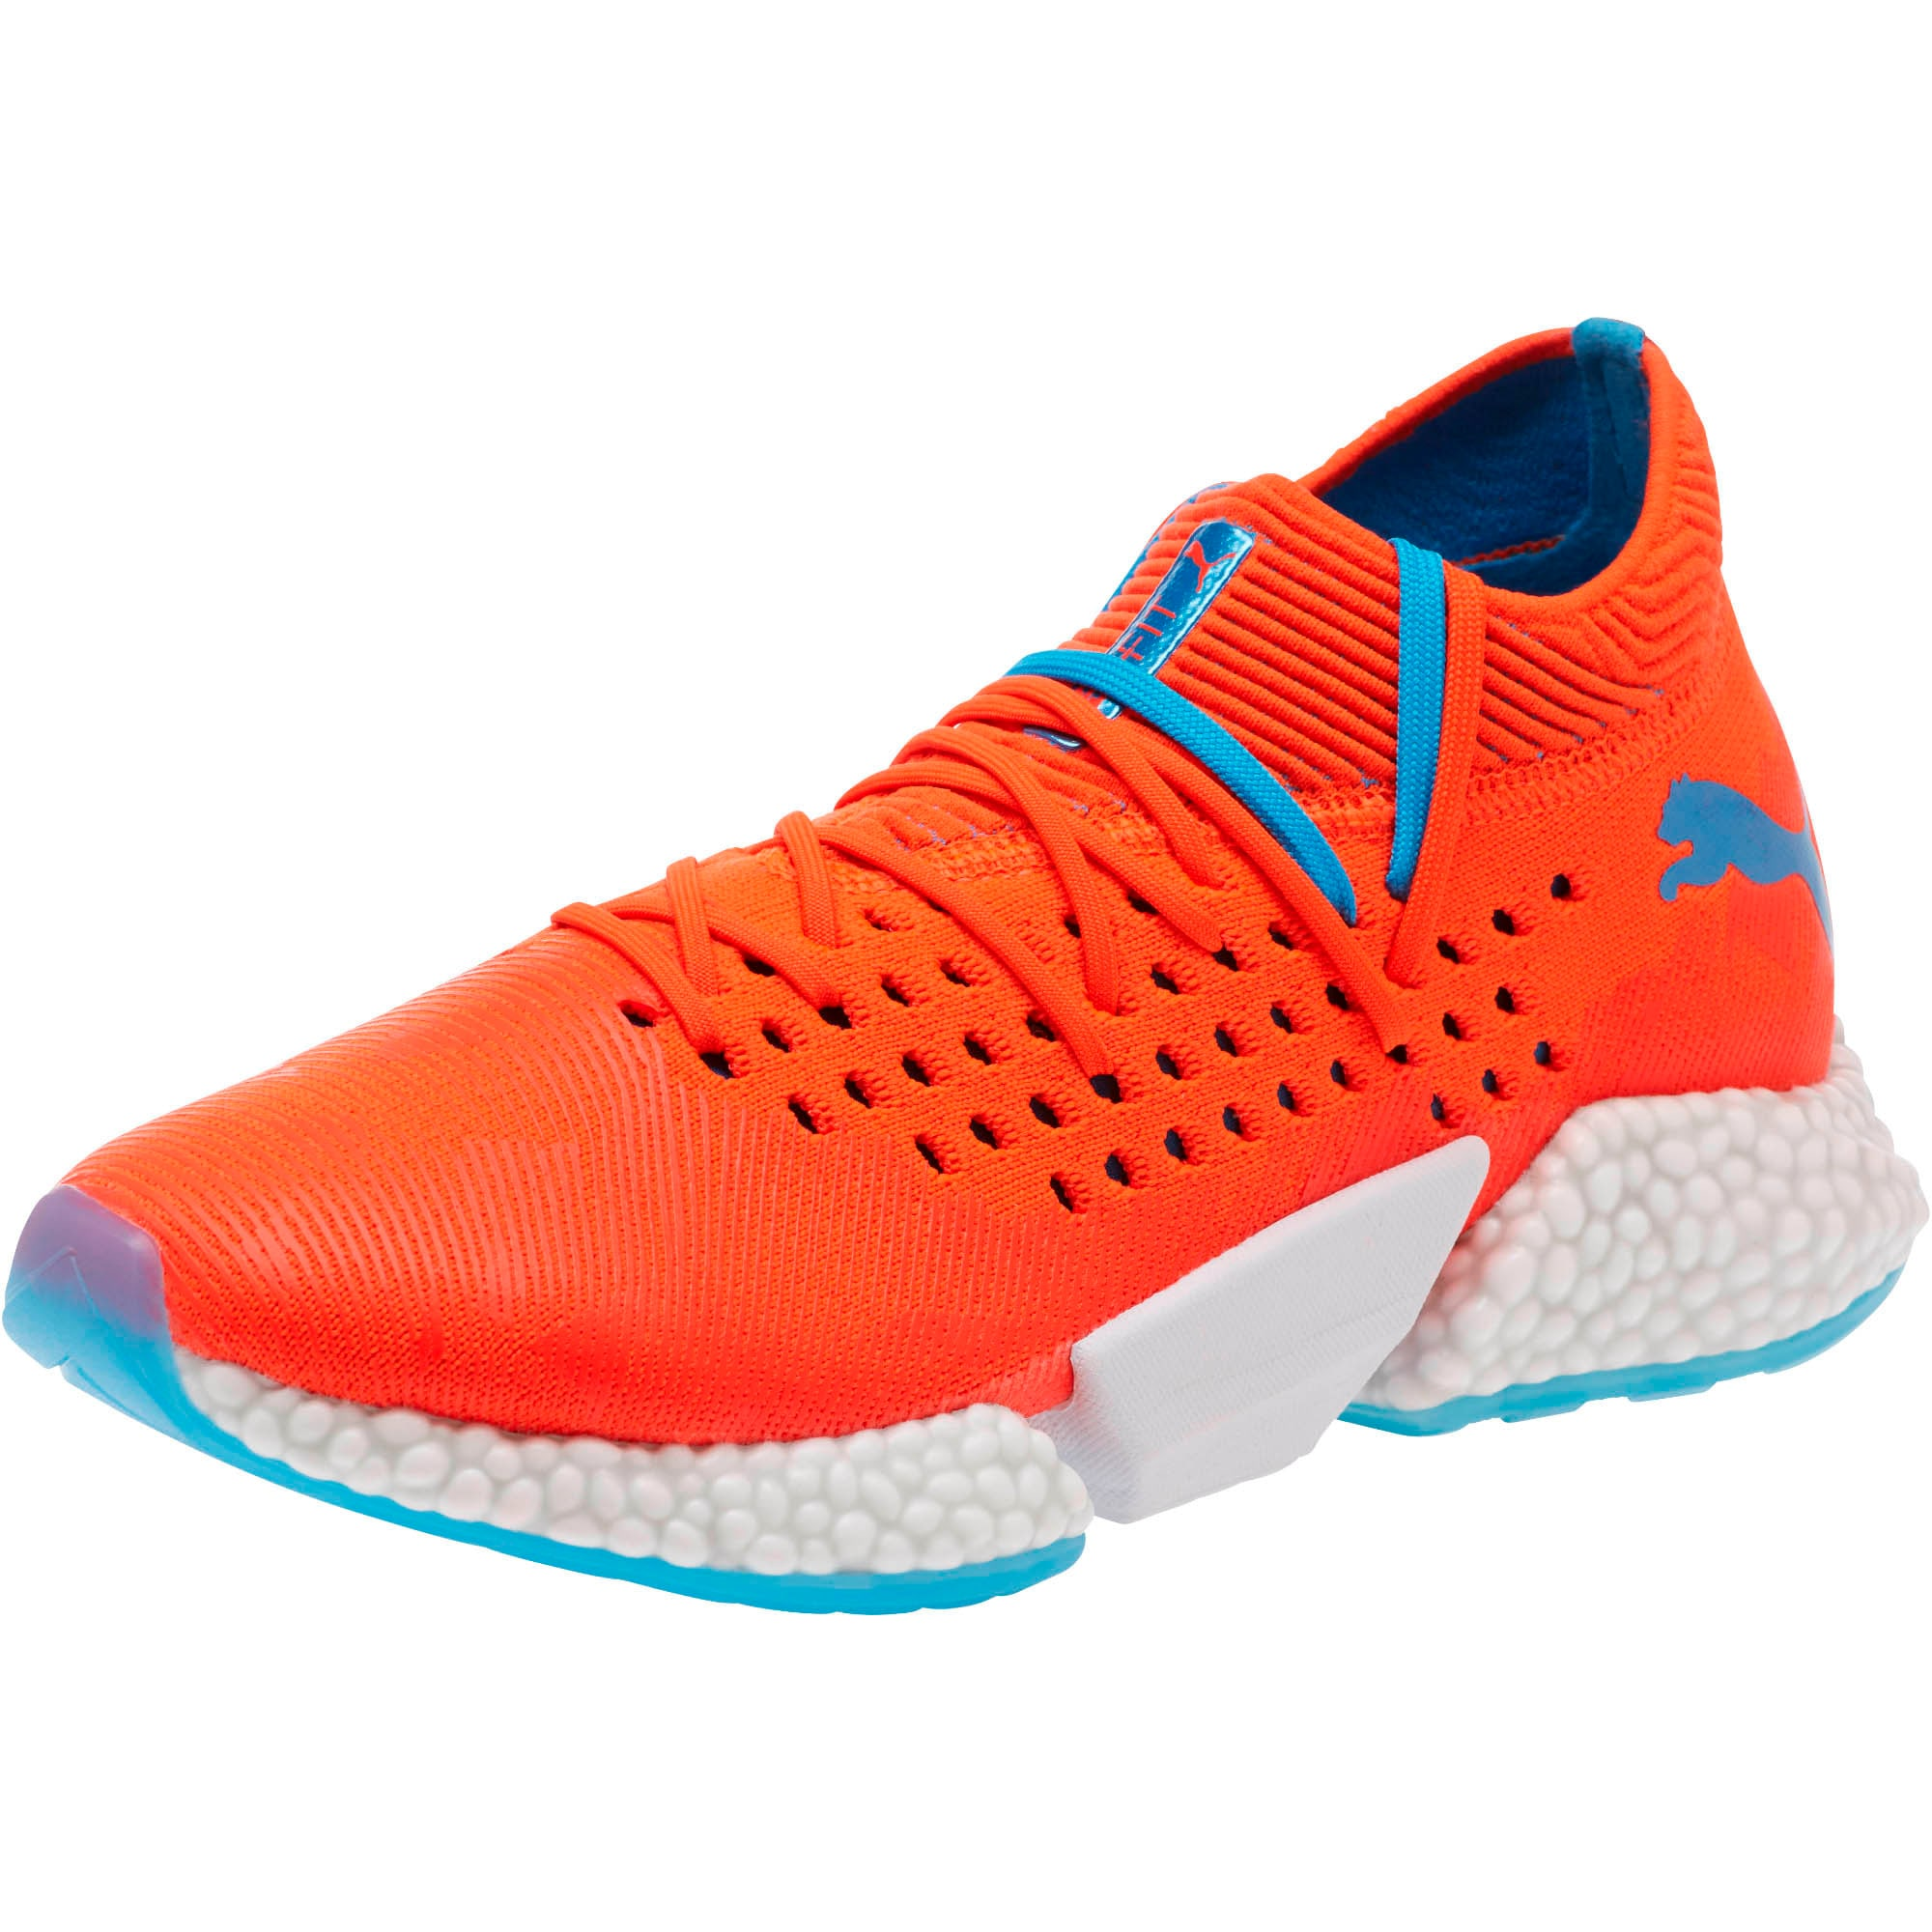 Thumbnail 1 of FUTURE Rocket Men's Running Shoes, Red Blast-Bleu Azur, medium